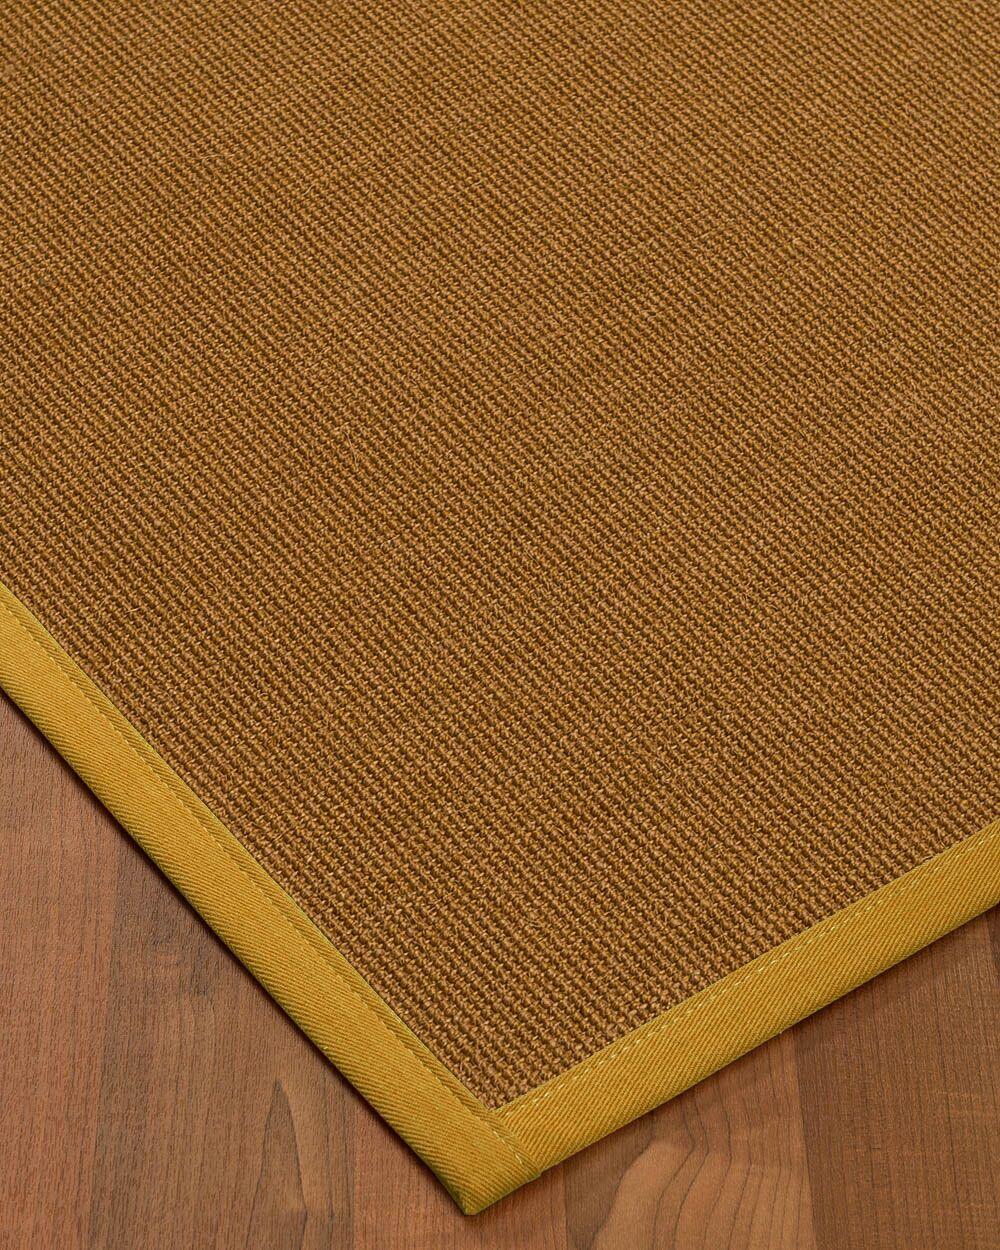 Antonina Border Hand-Woven Brown/Tan Area Rug Rug Size: Rectangle 12' x 15', Rug Pad Included: Yes